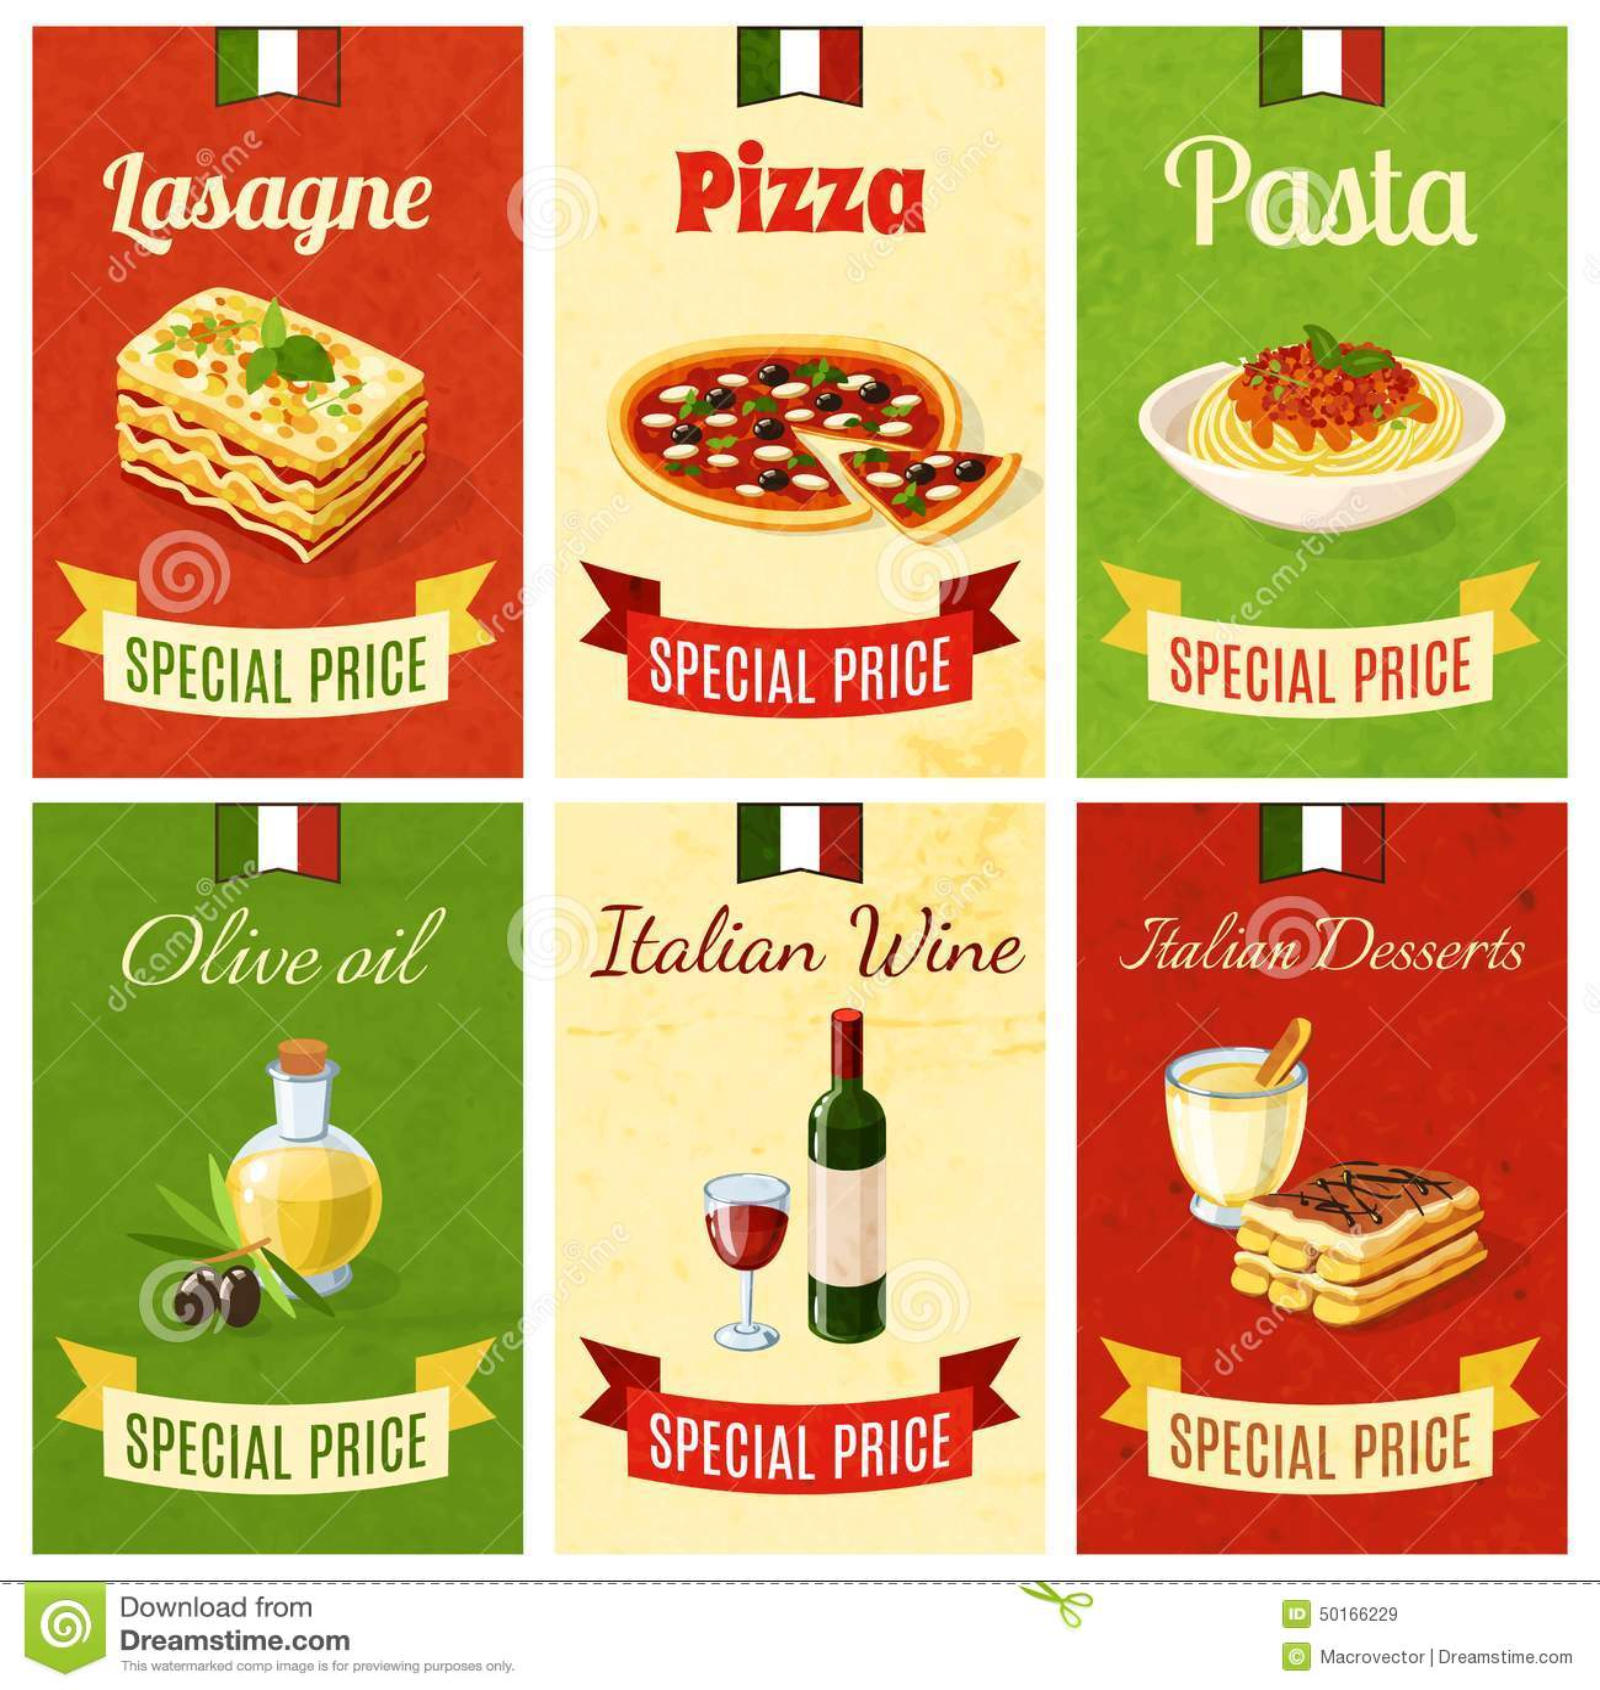 Watch Fresh Tomato Pizza video